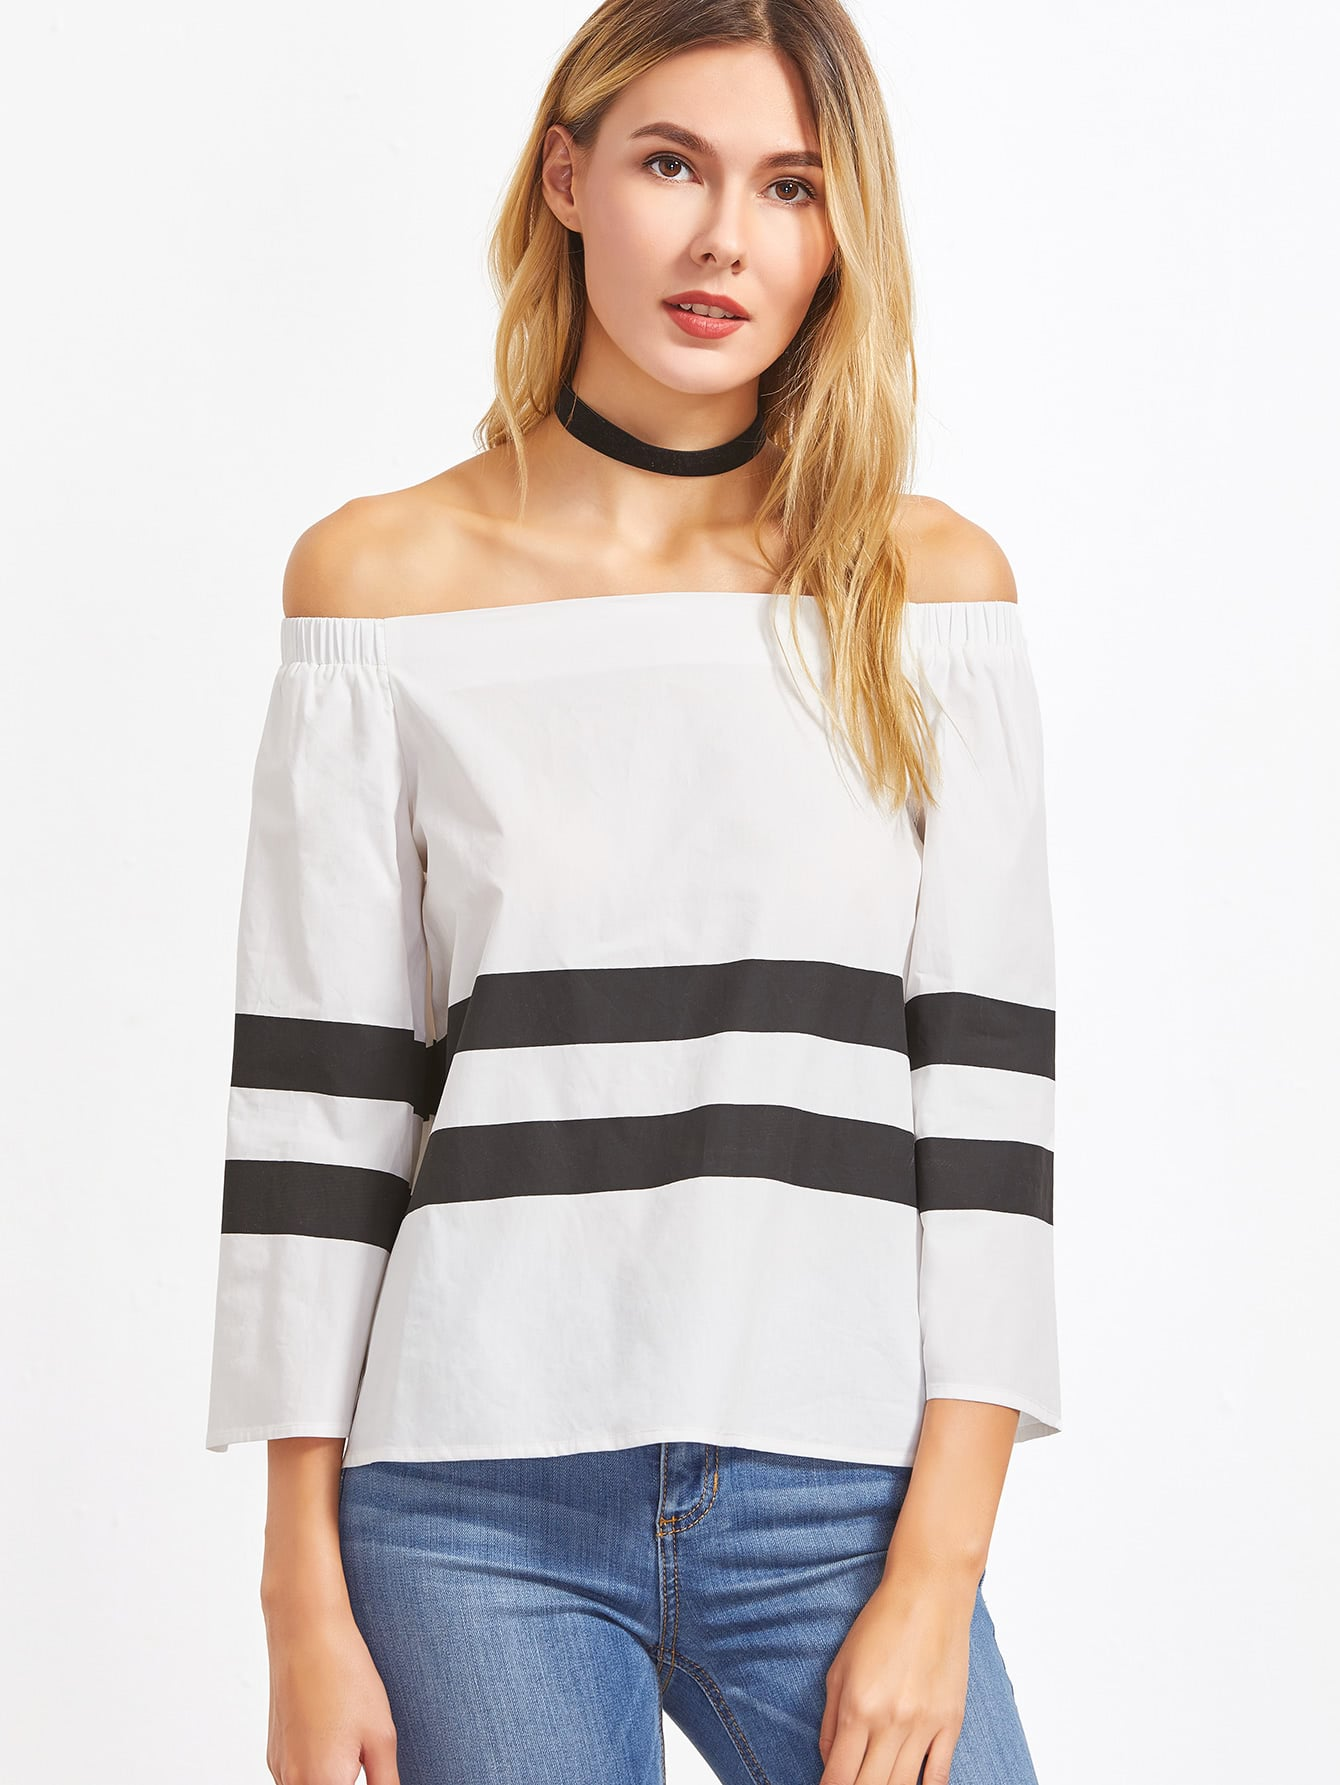 blouse161130719_2